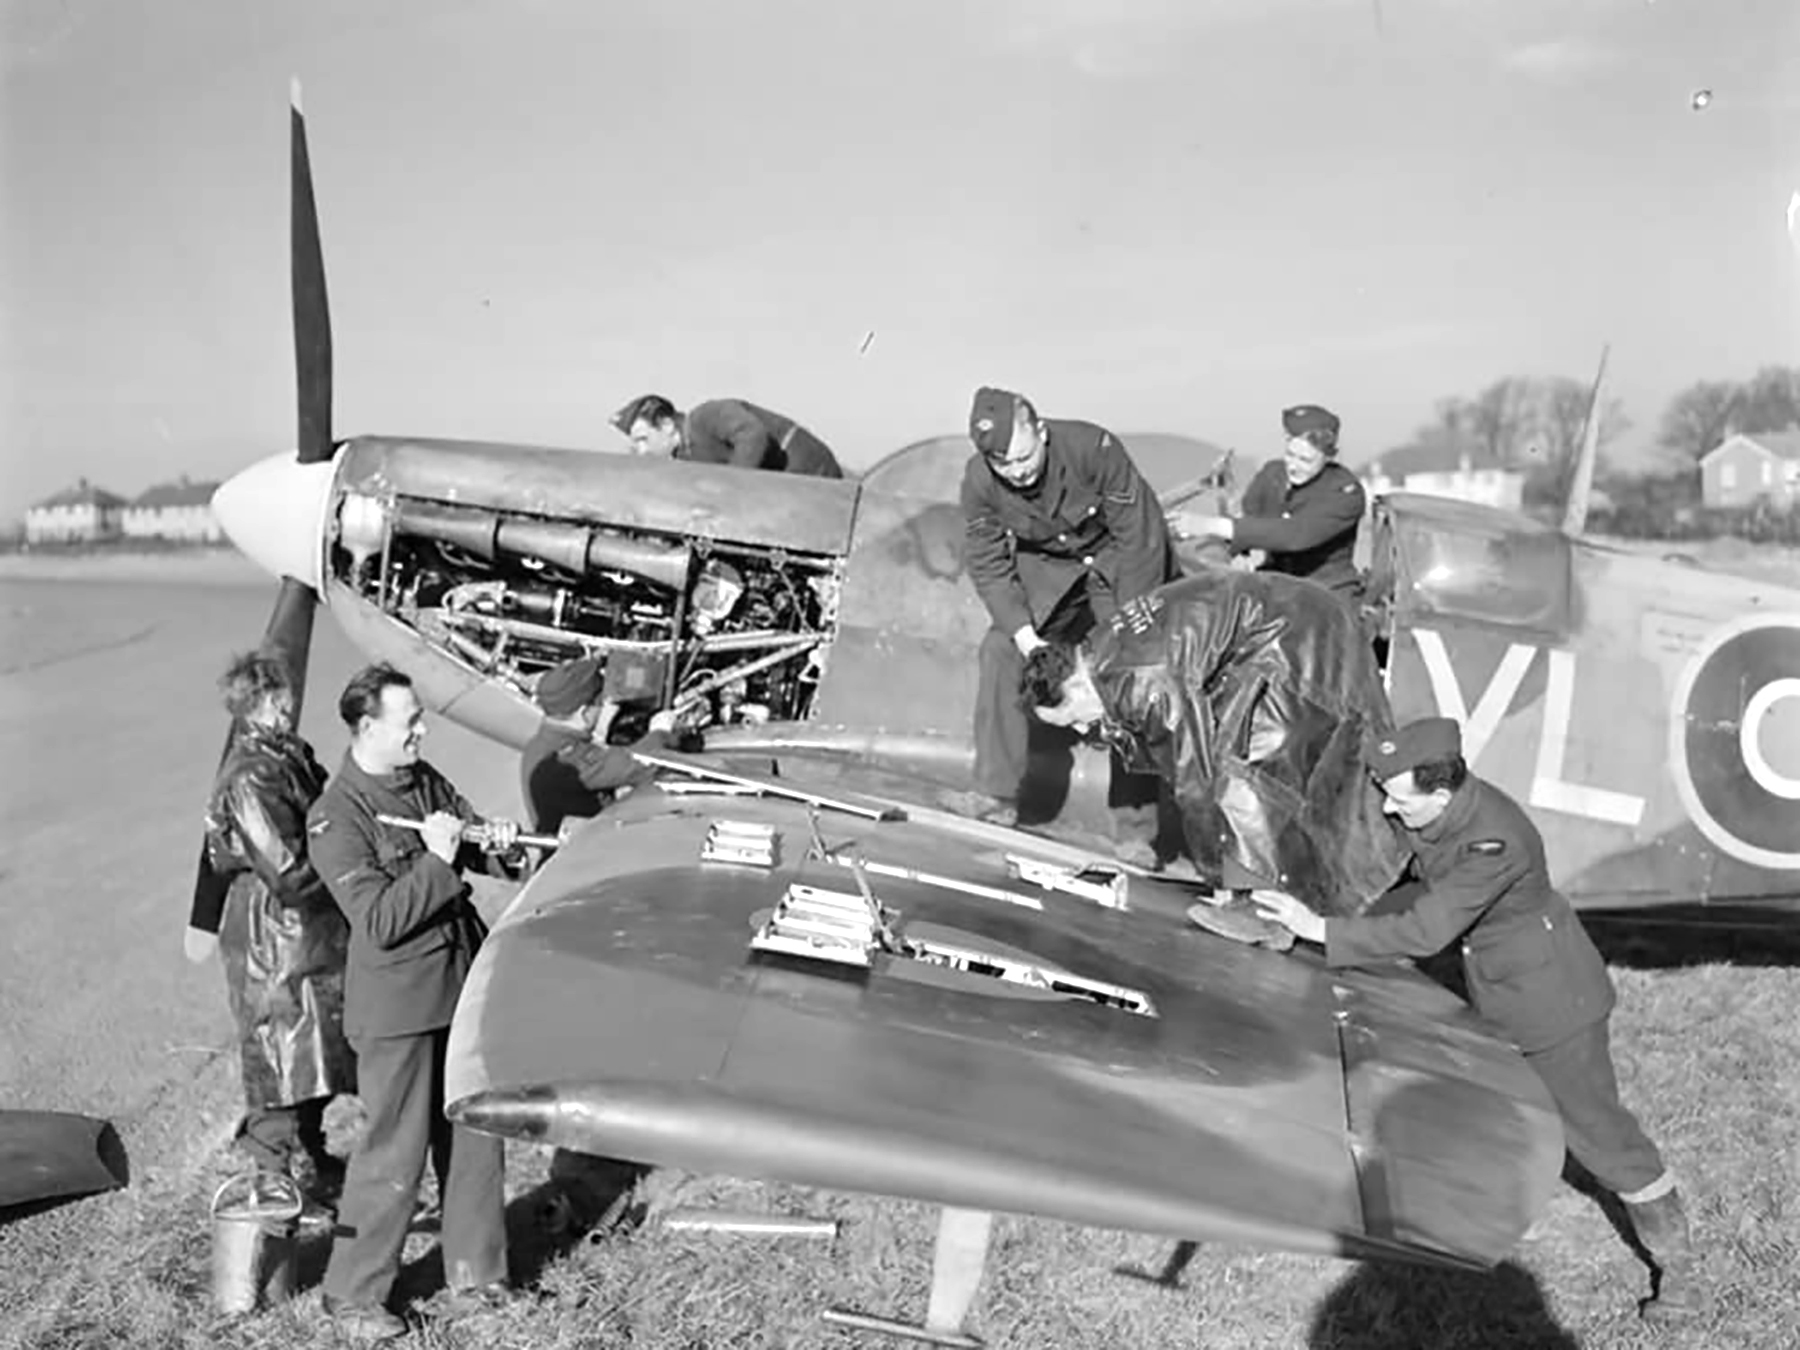 Spitfire LFVB RAF 322Sqn being rearmed at Hawkinge Feb 1944 web 01